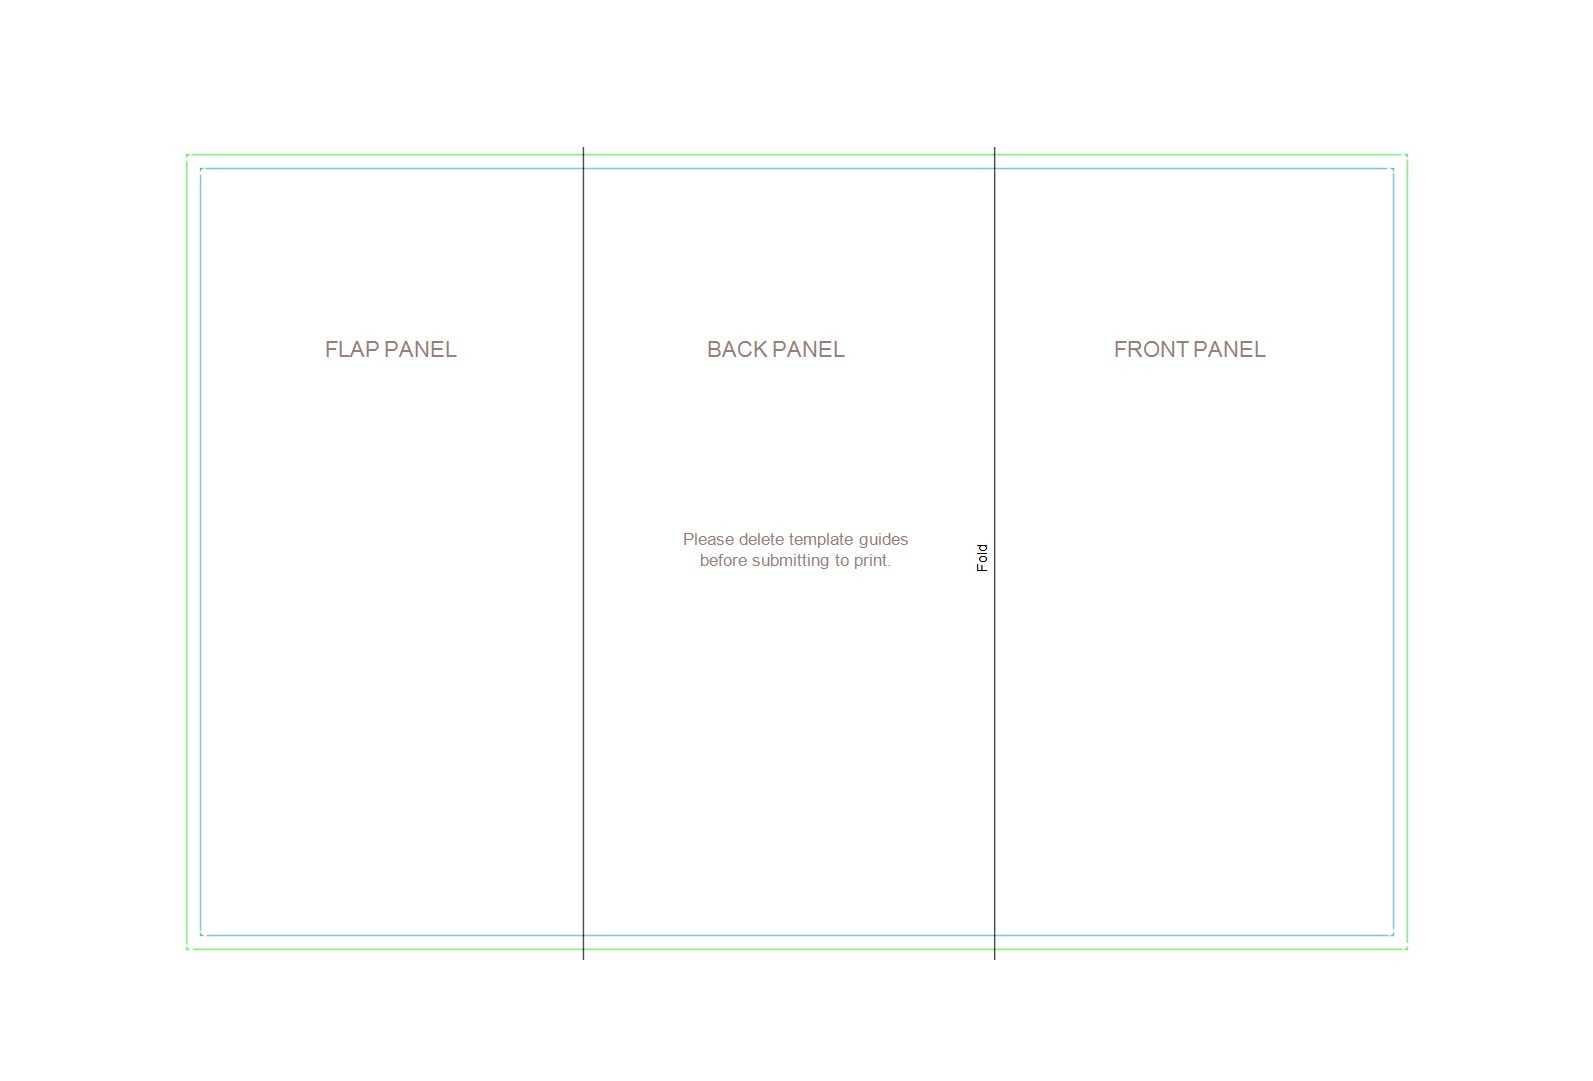 50 Free Pamphlet Templates [Word / Google Docs] ᐅ Template Lab Regarding Brochure Templates For Google Docs